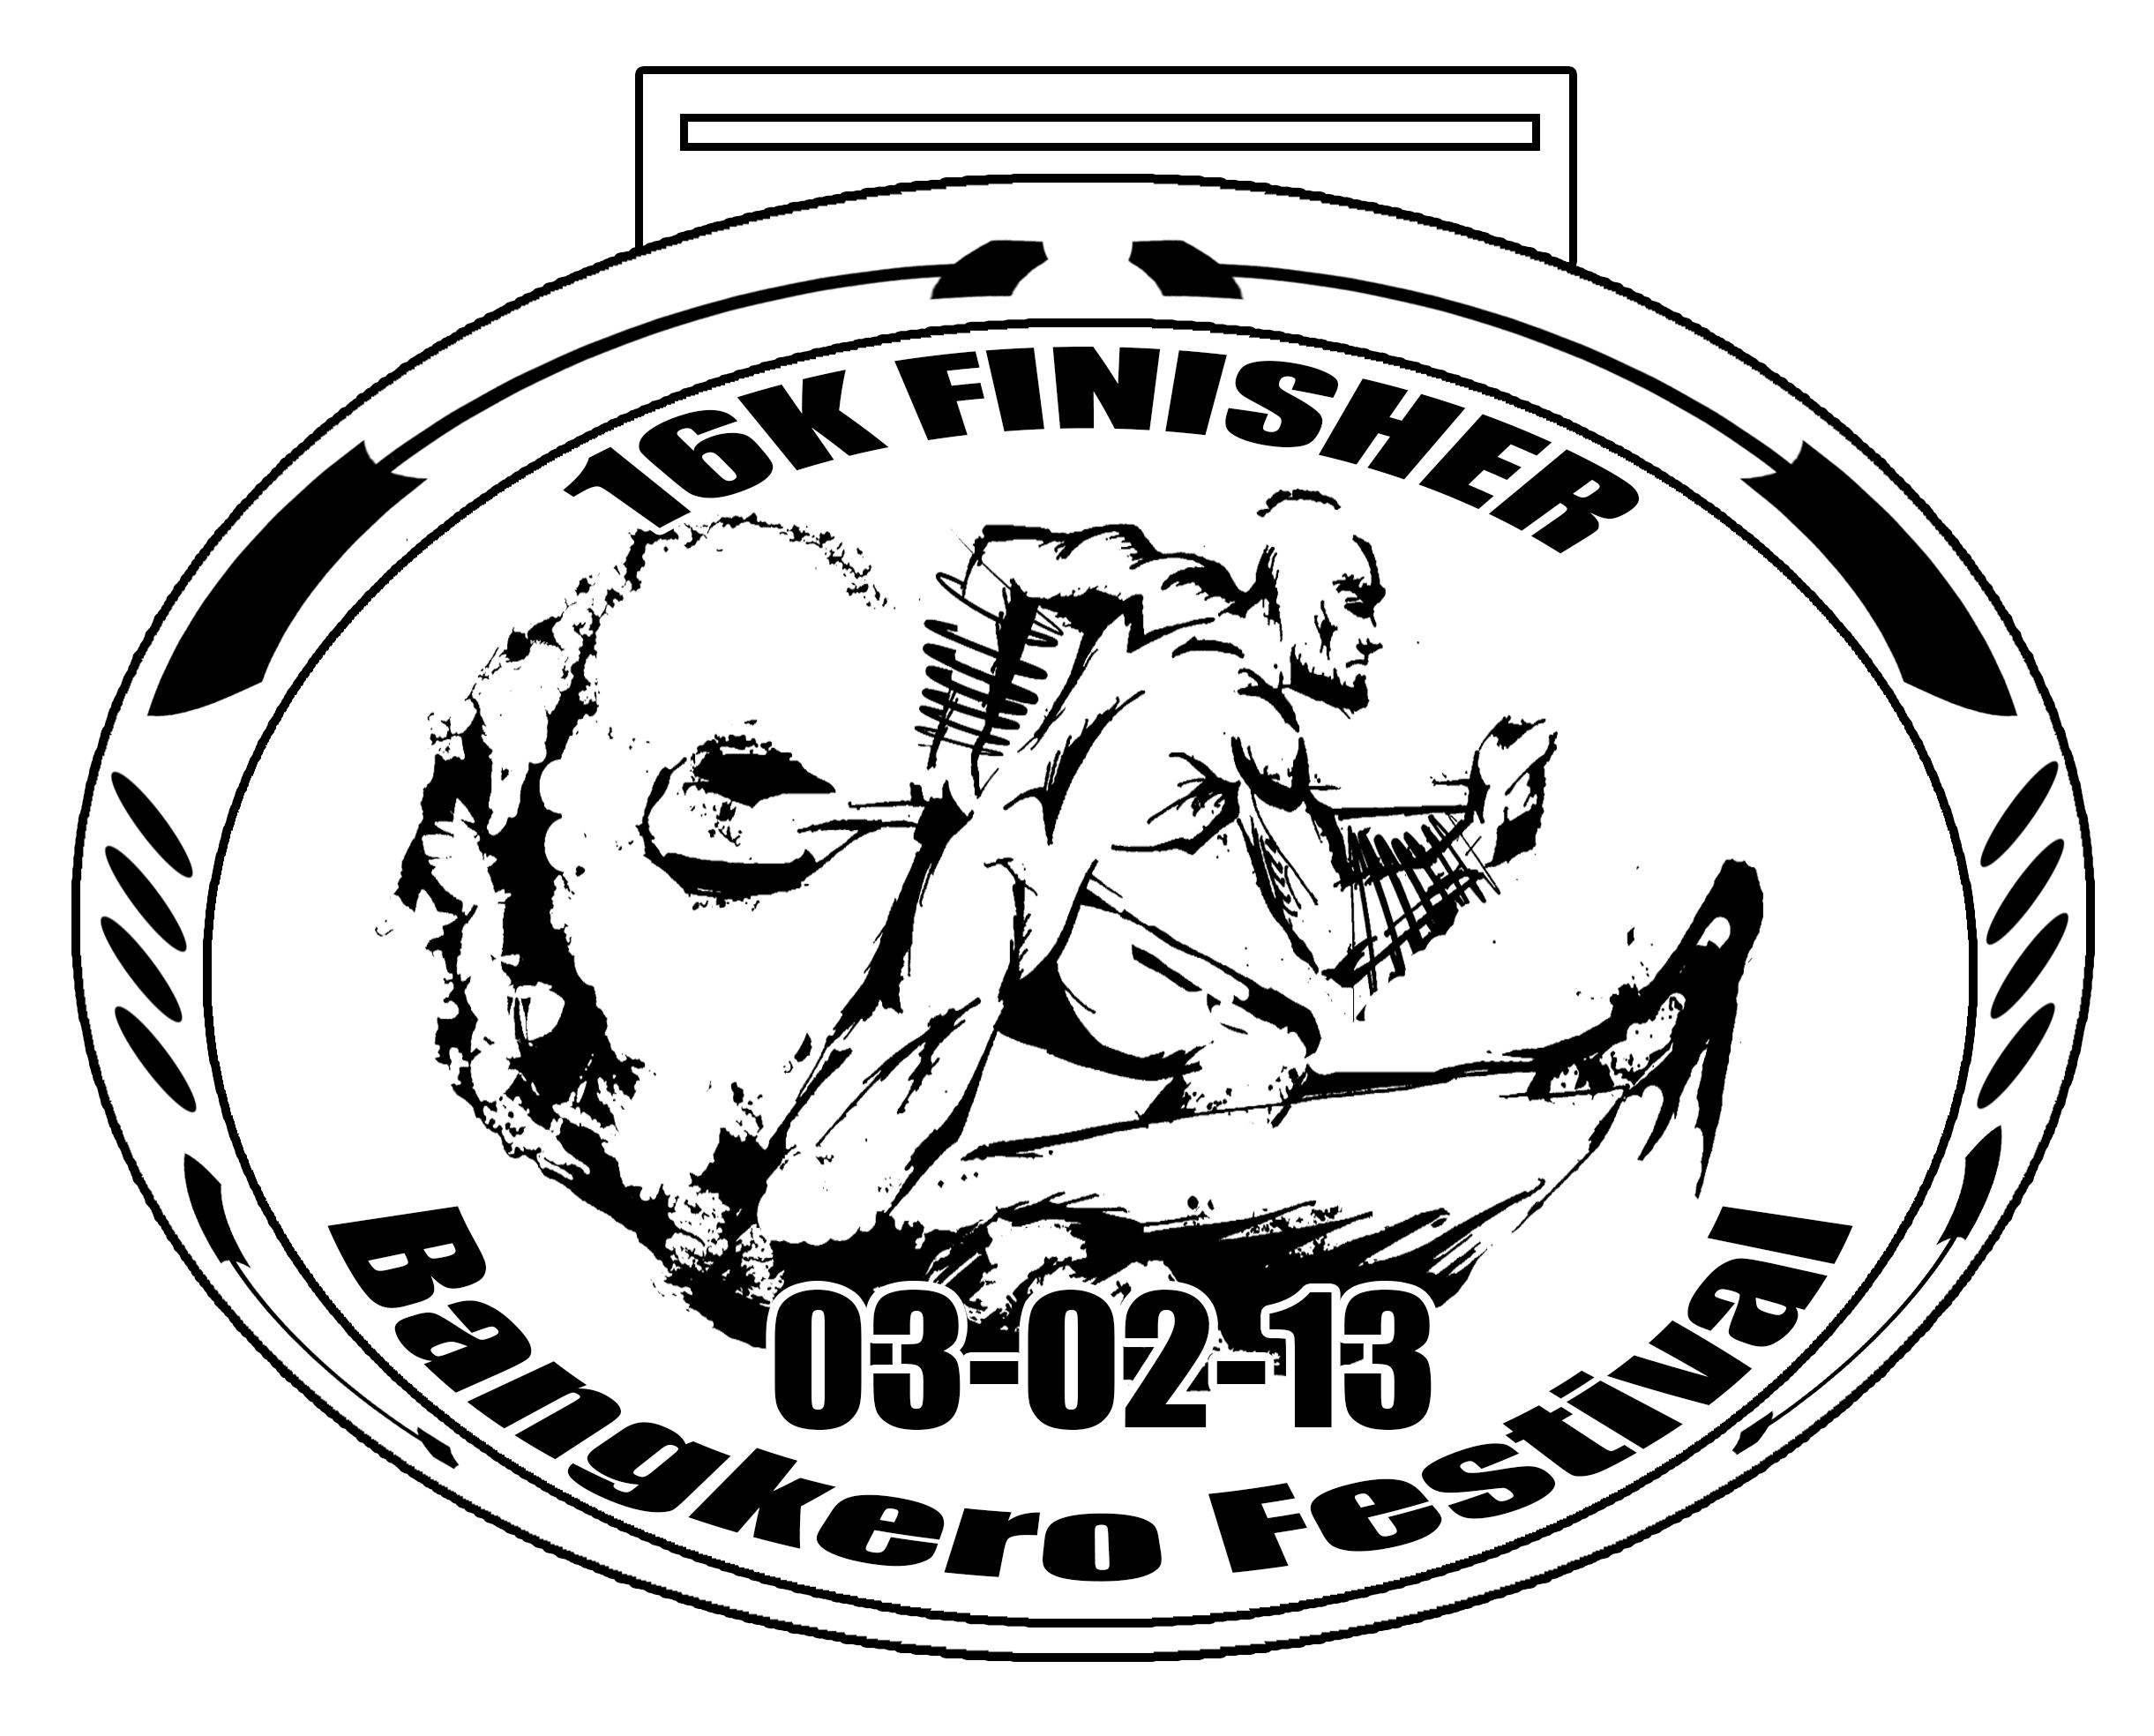 bangkero-festival-run-2013-medal-design